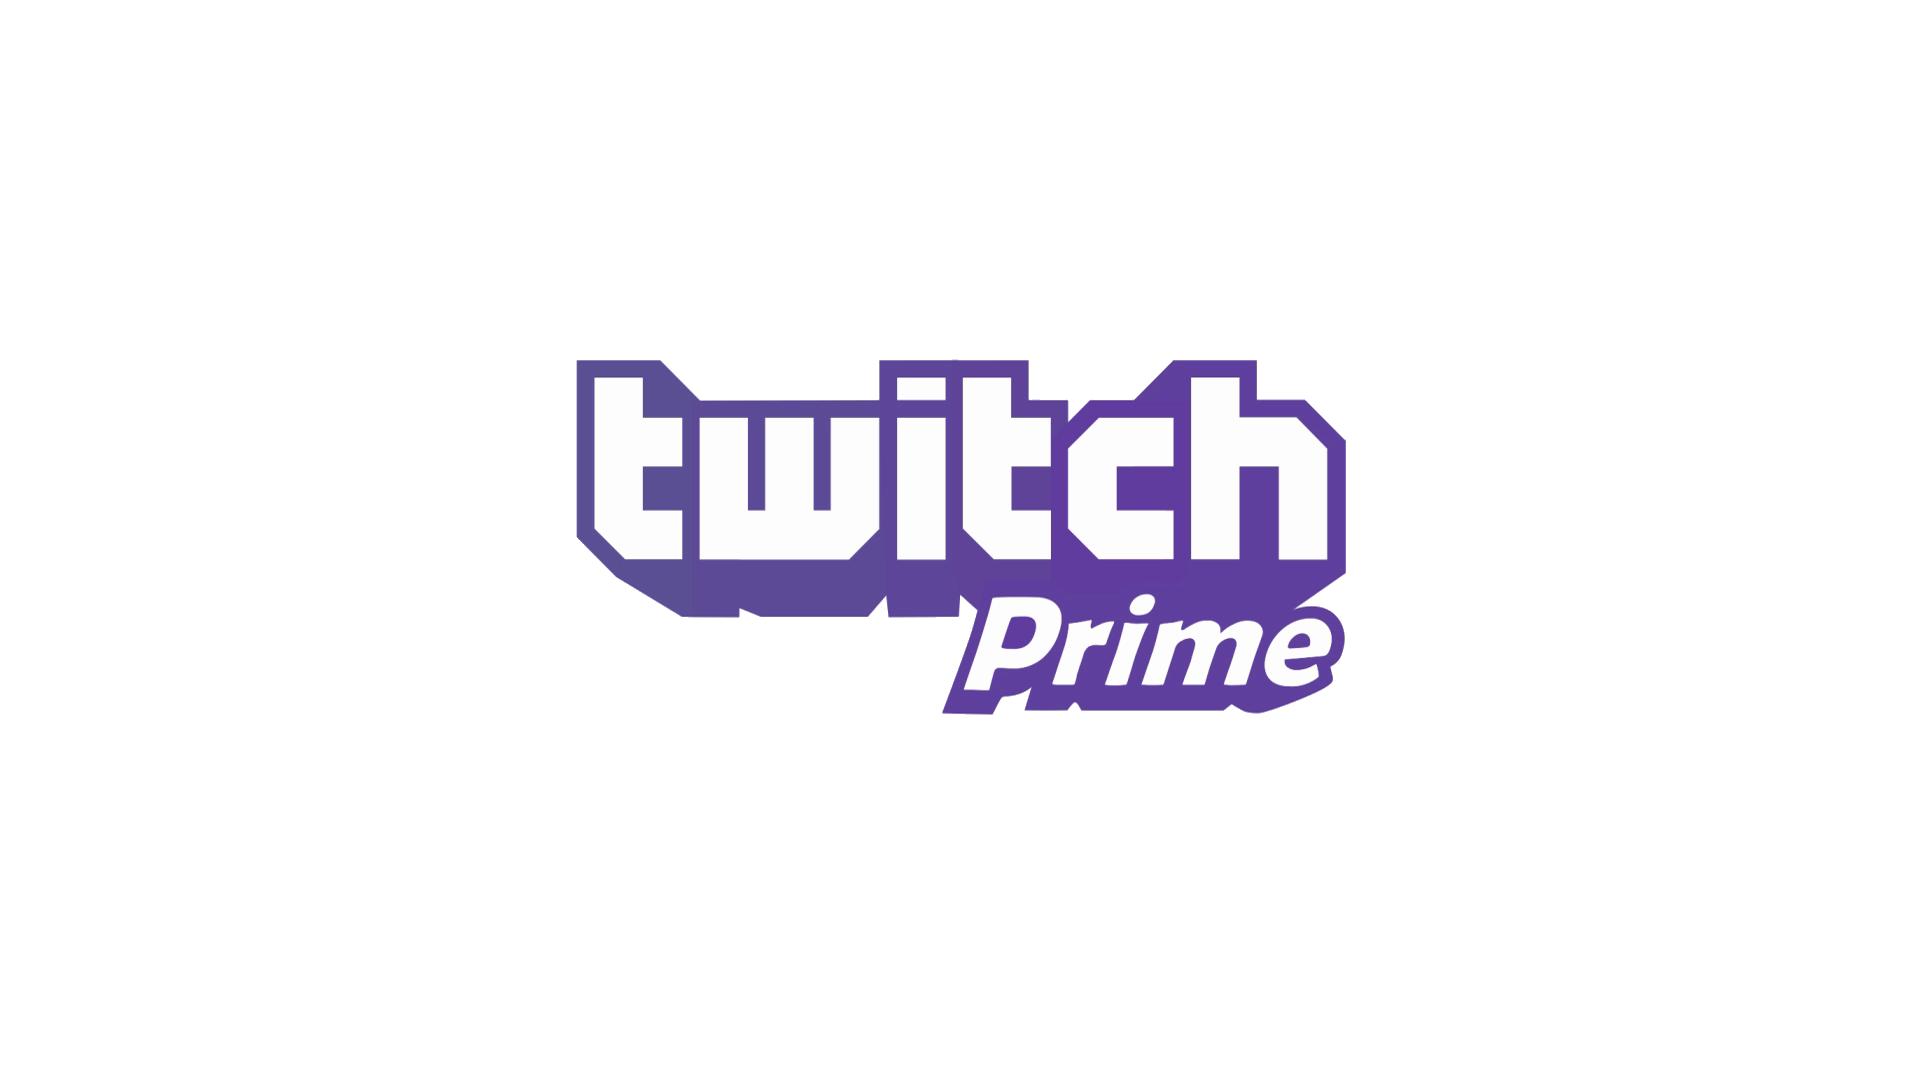 twitch prime logo high resolution